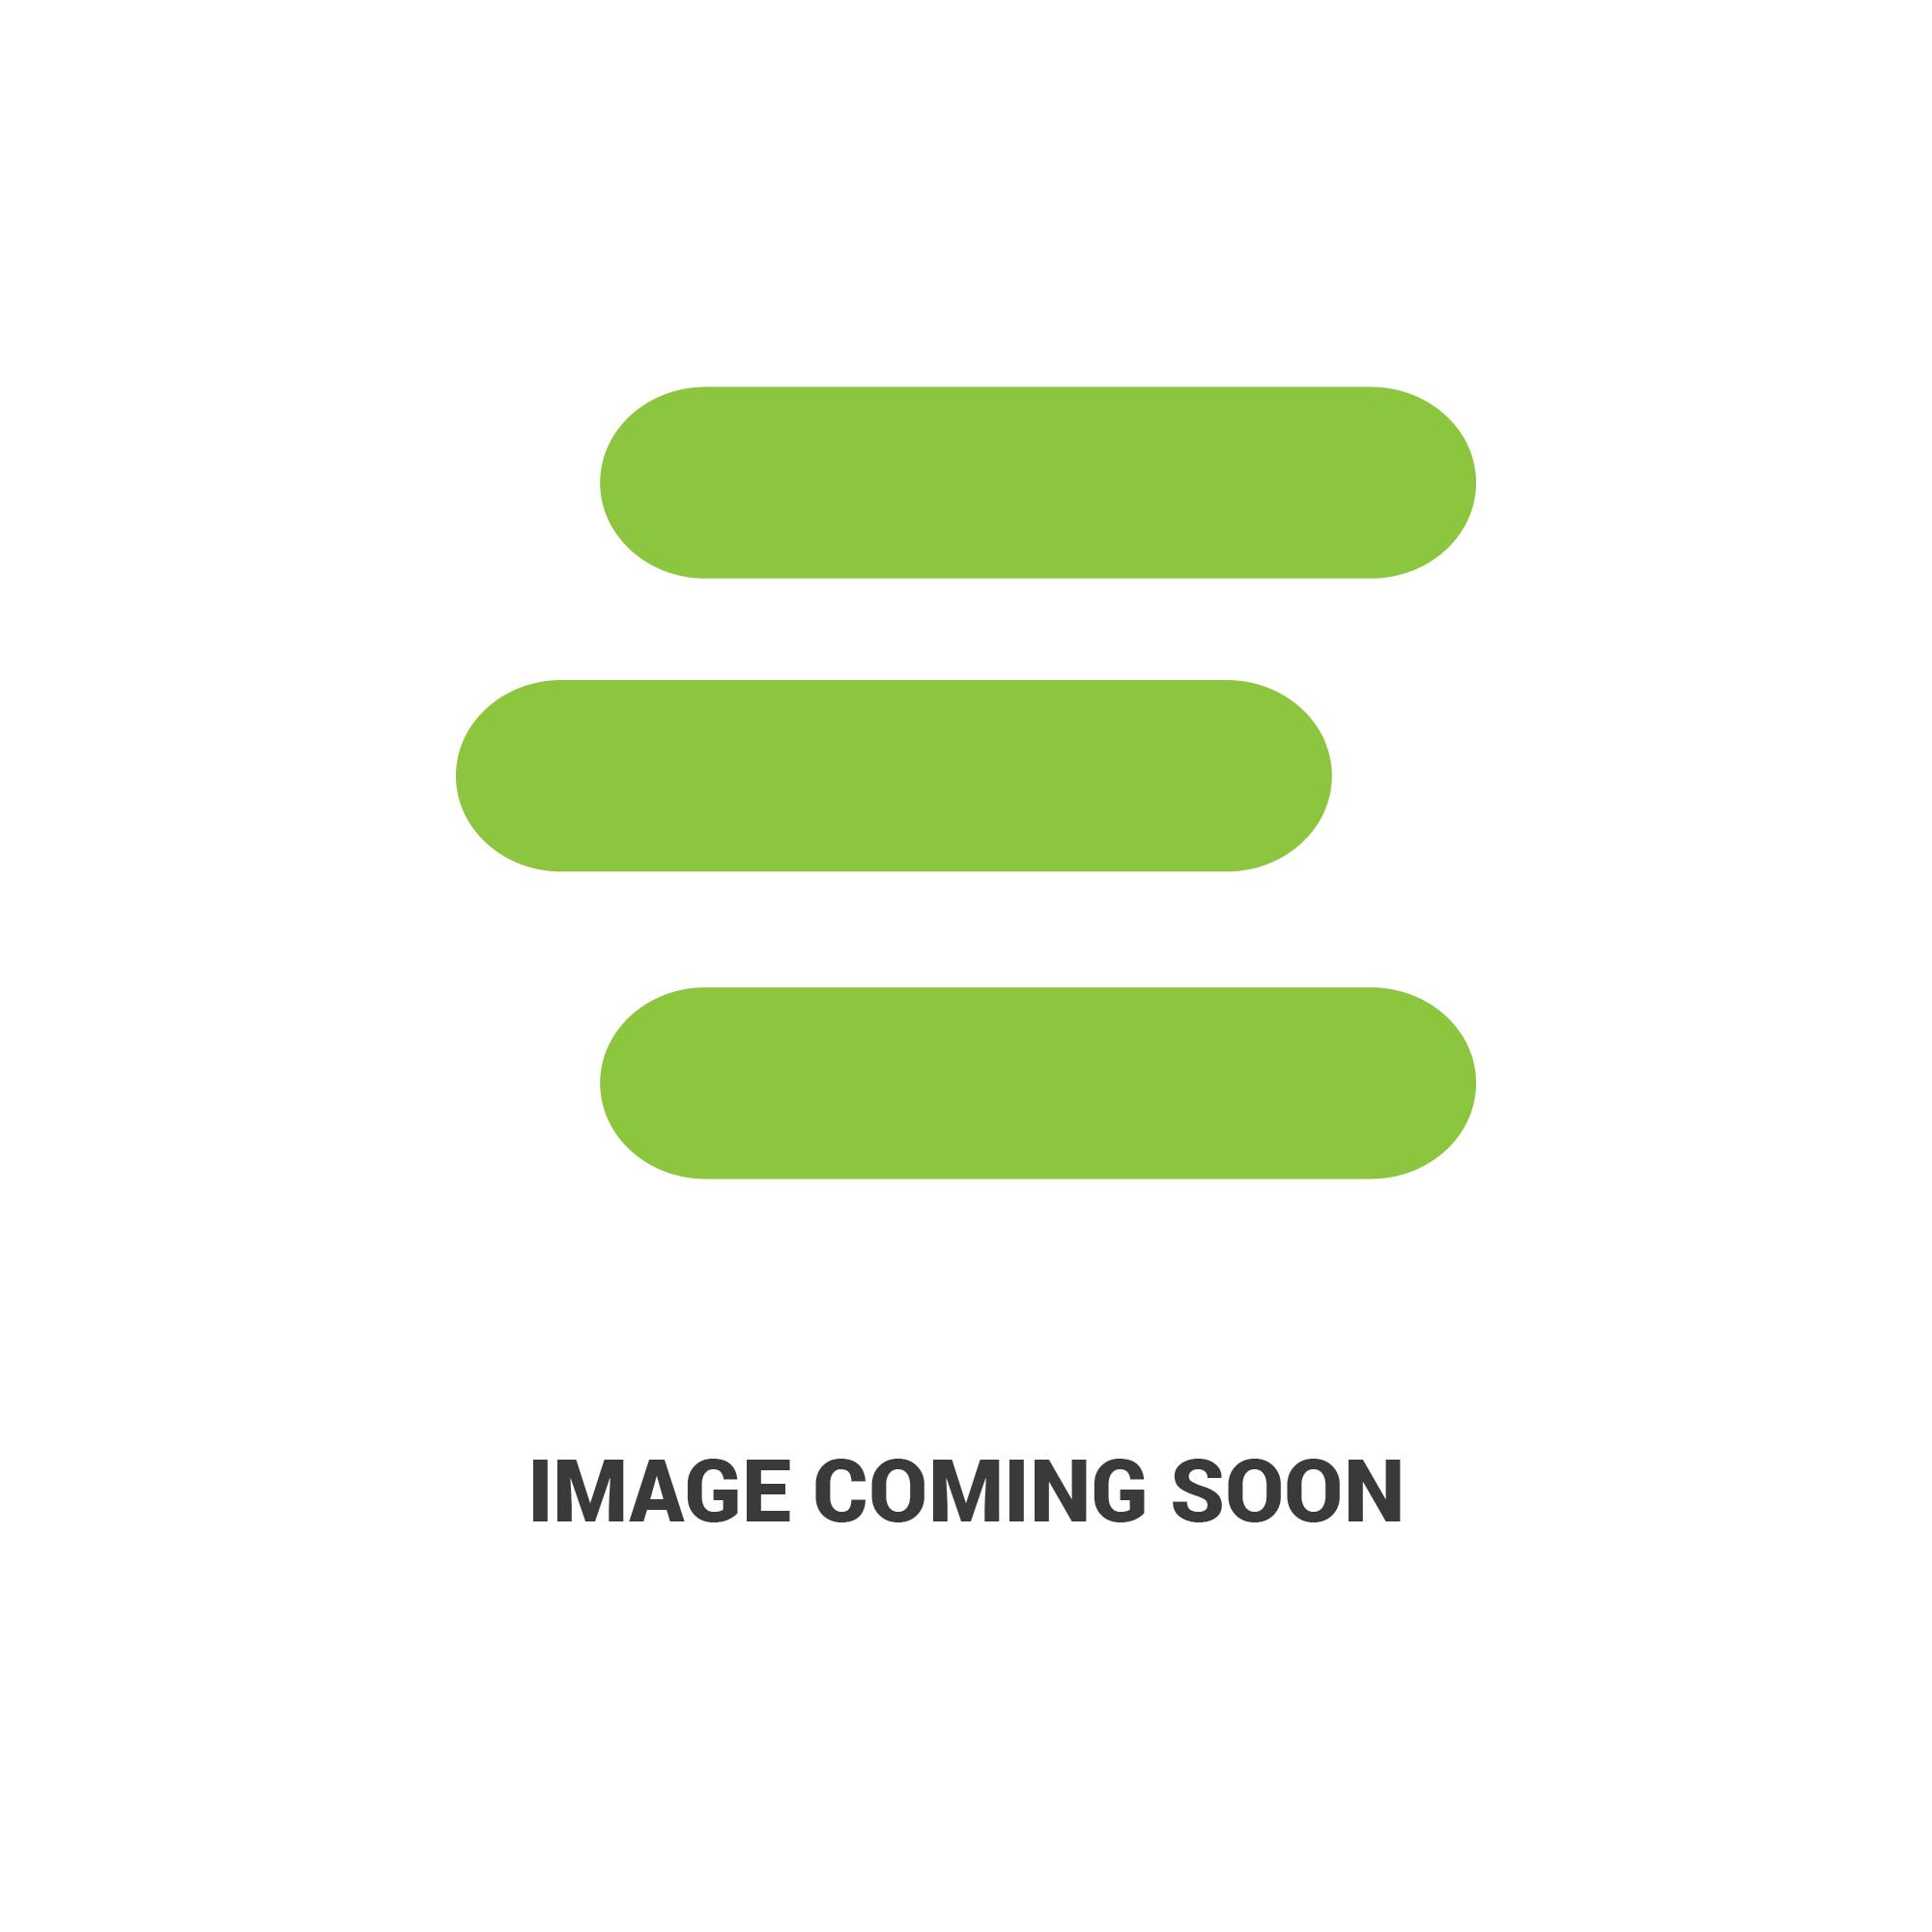 E-6689611edit 1.jpg